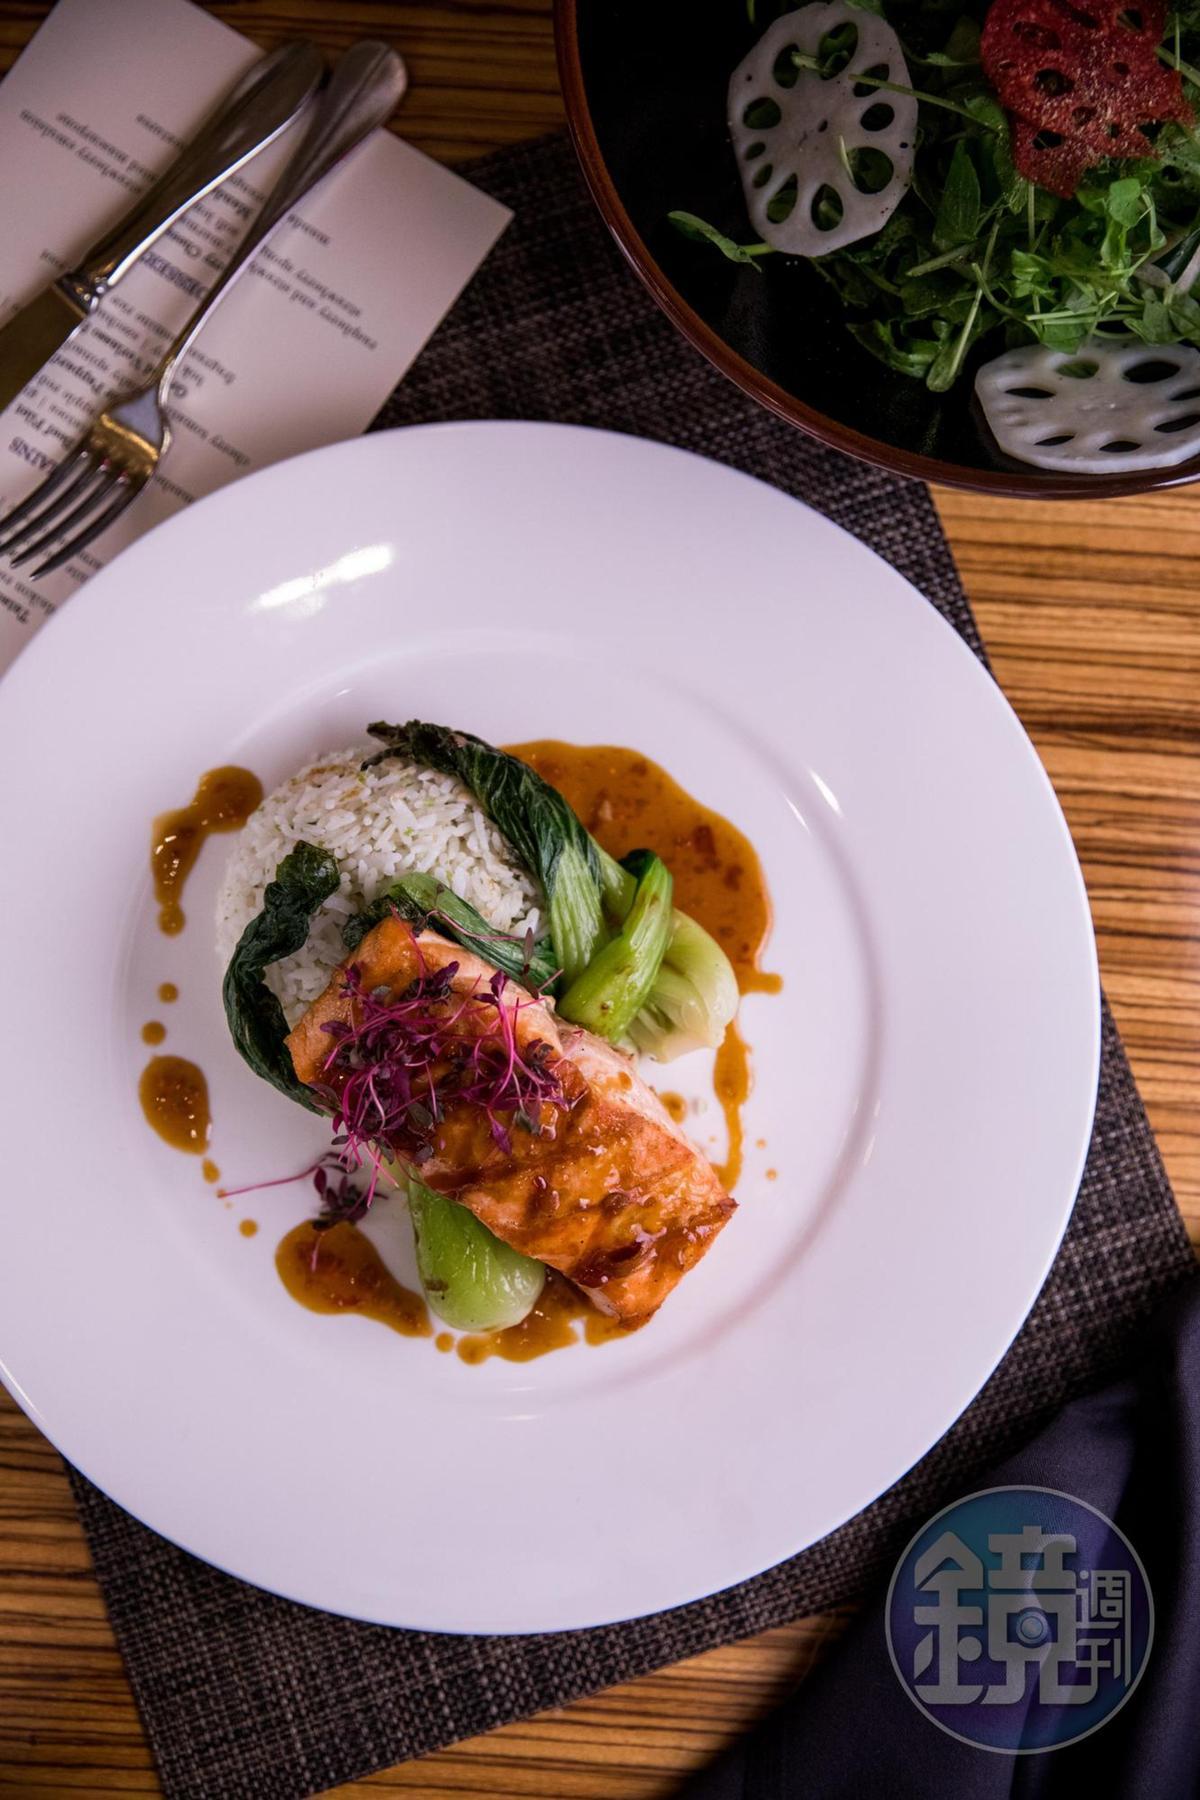 「Muze」餐廳的招牌菜,是烤鮭魚配上米飯,有中西融合的感覺。